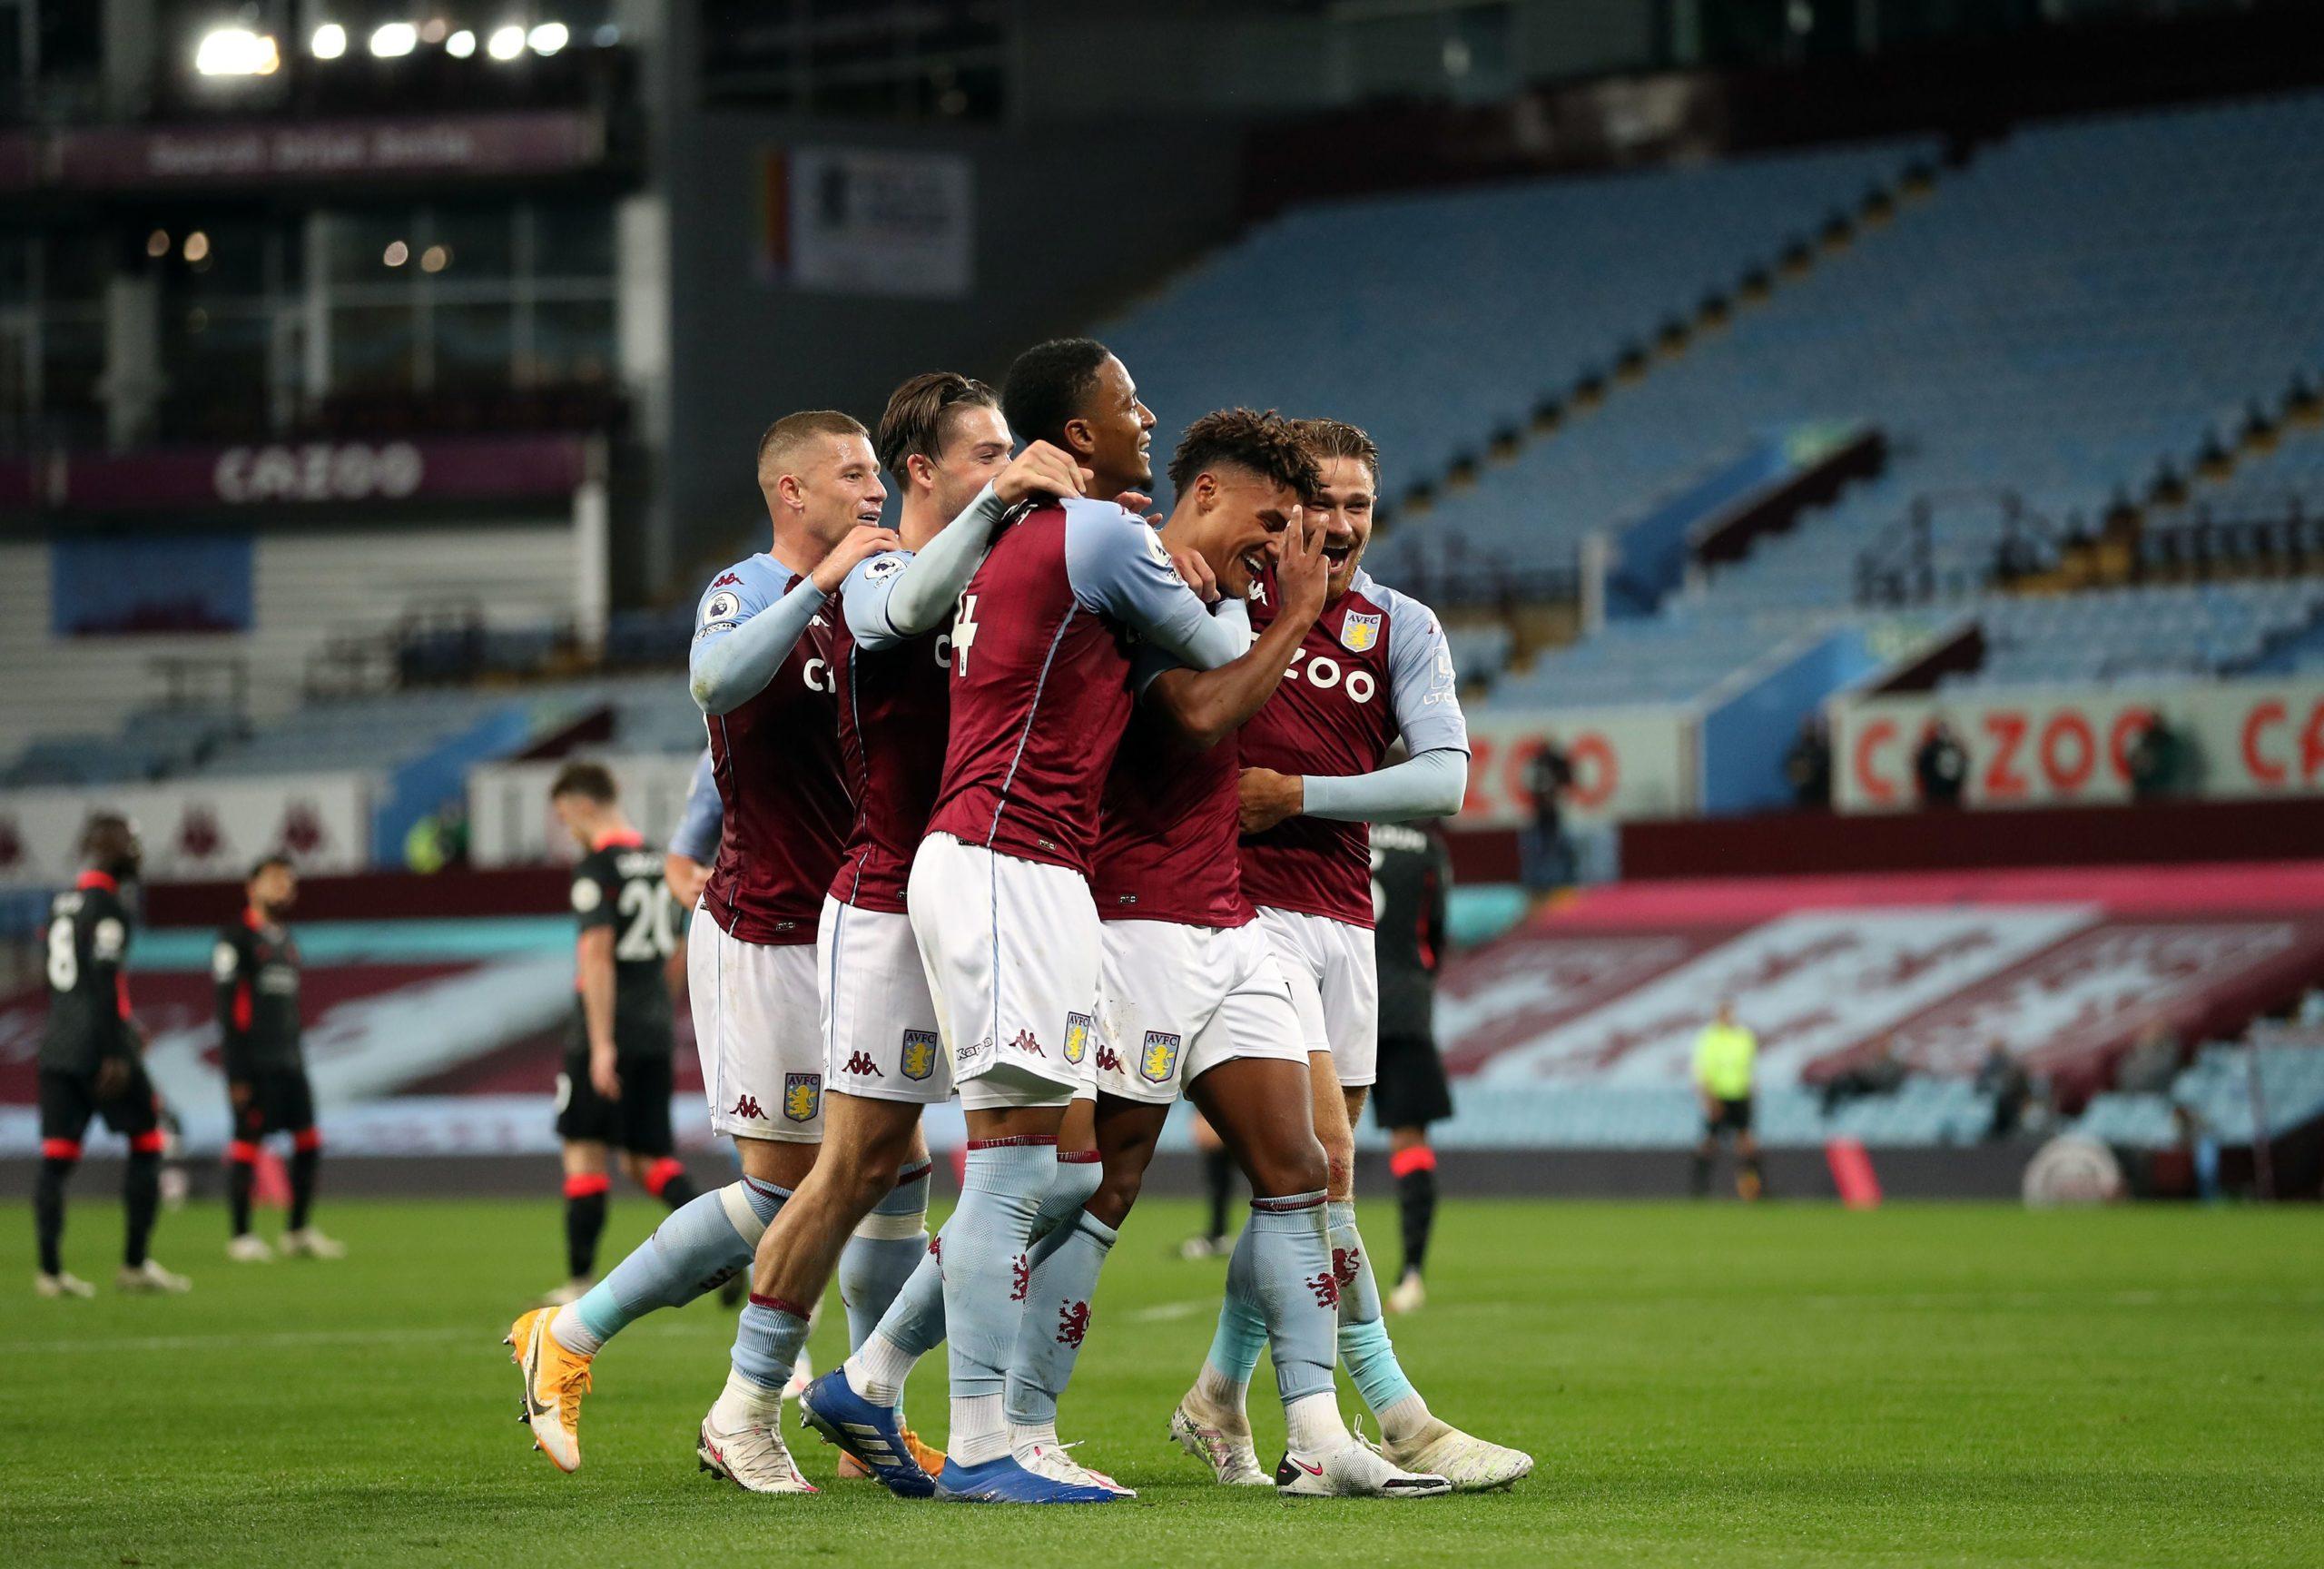 Aston Villa vs. Liverpool | ผลบอลสดวันนี้ ดูบอลสด รายงานผล ...